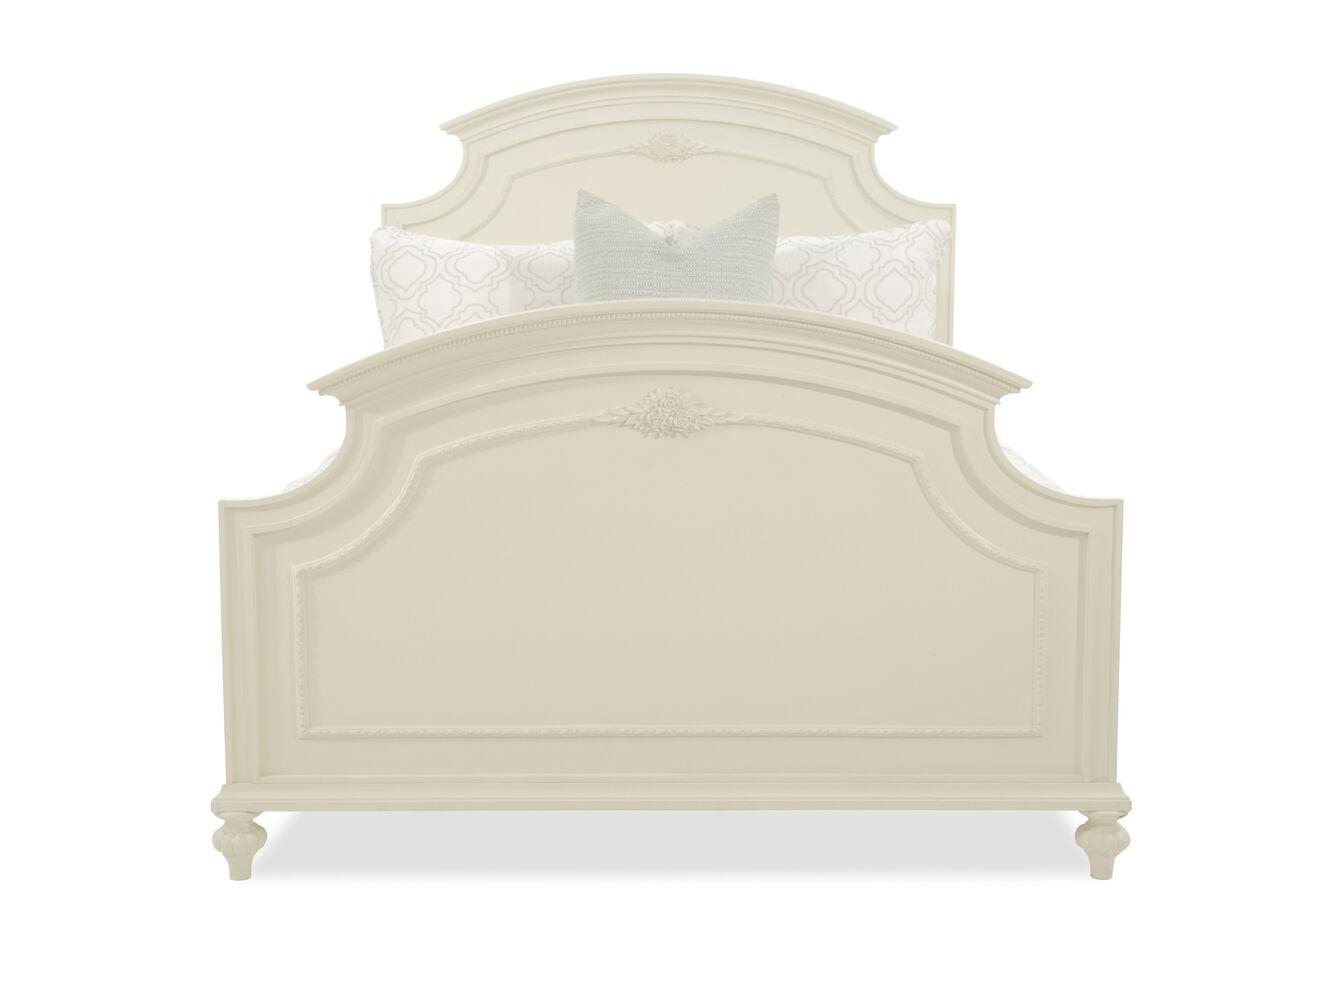 Universal Smartstuff Gabriella Panel Bed